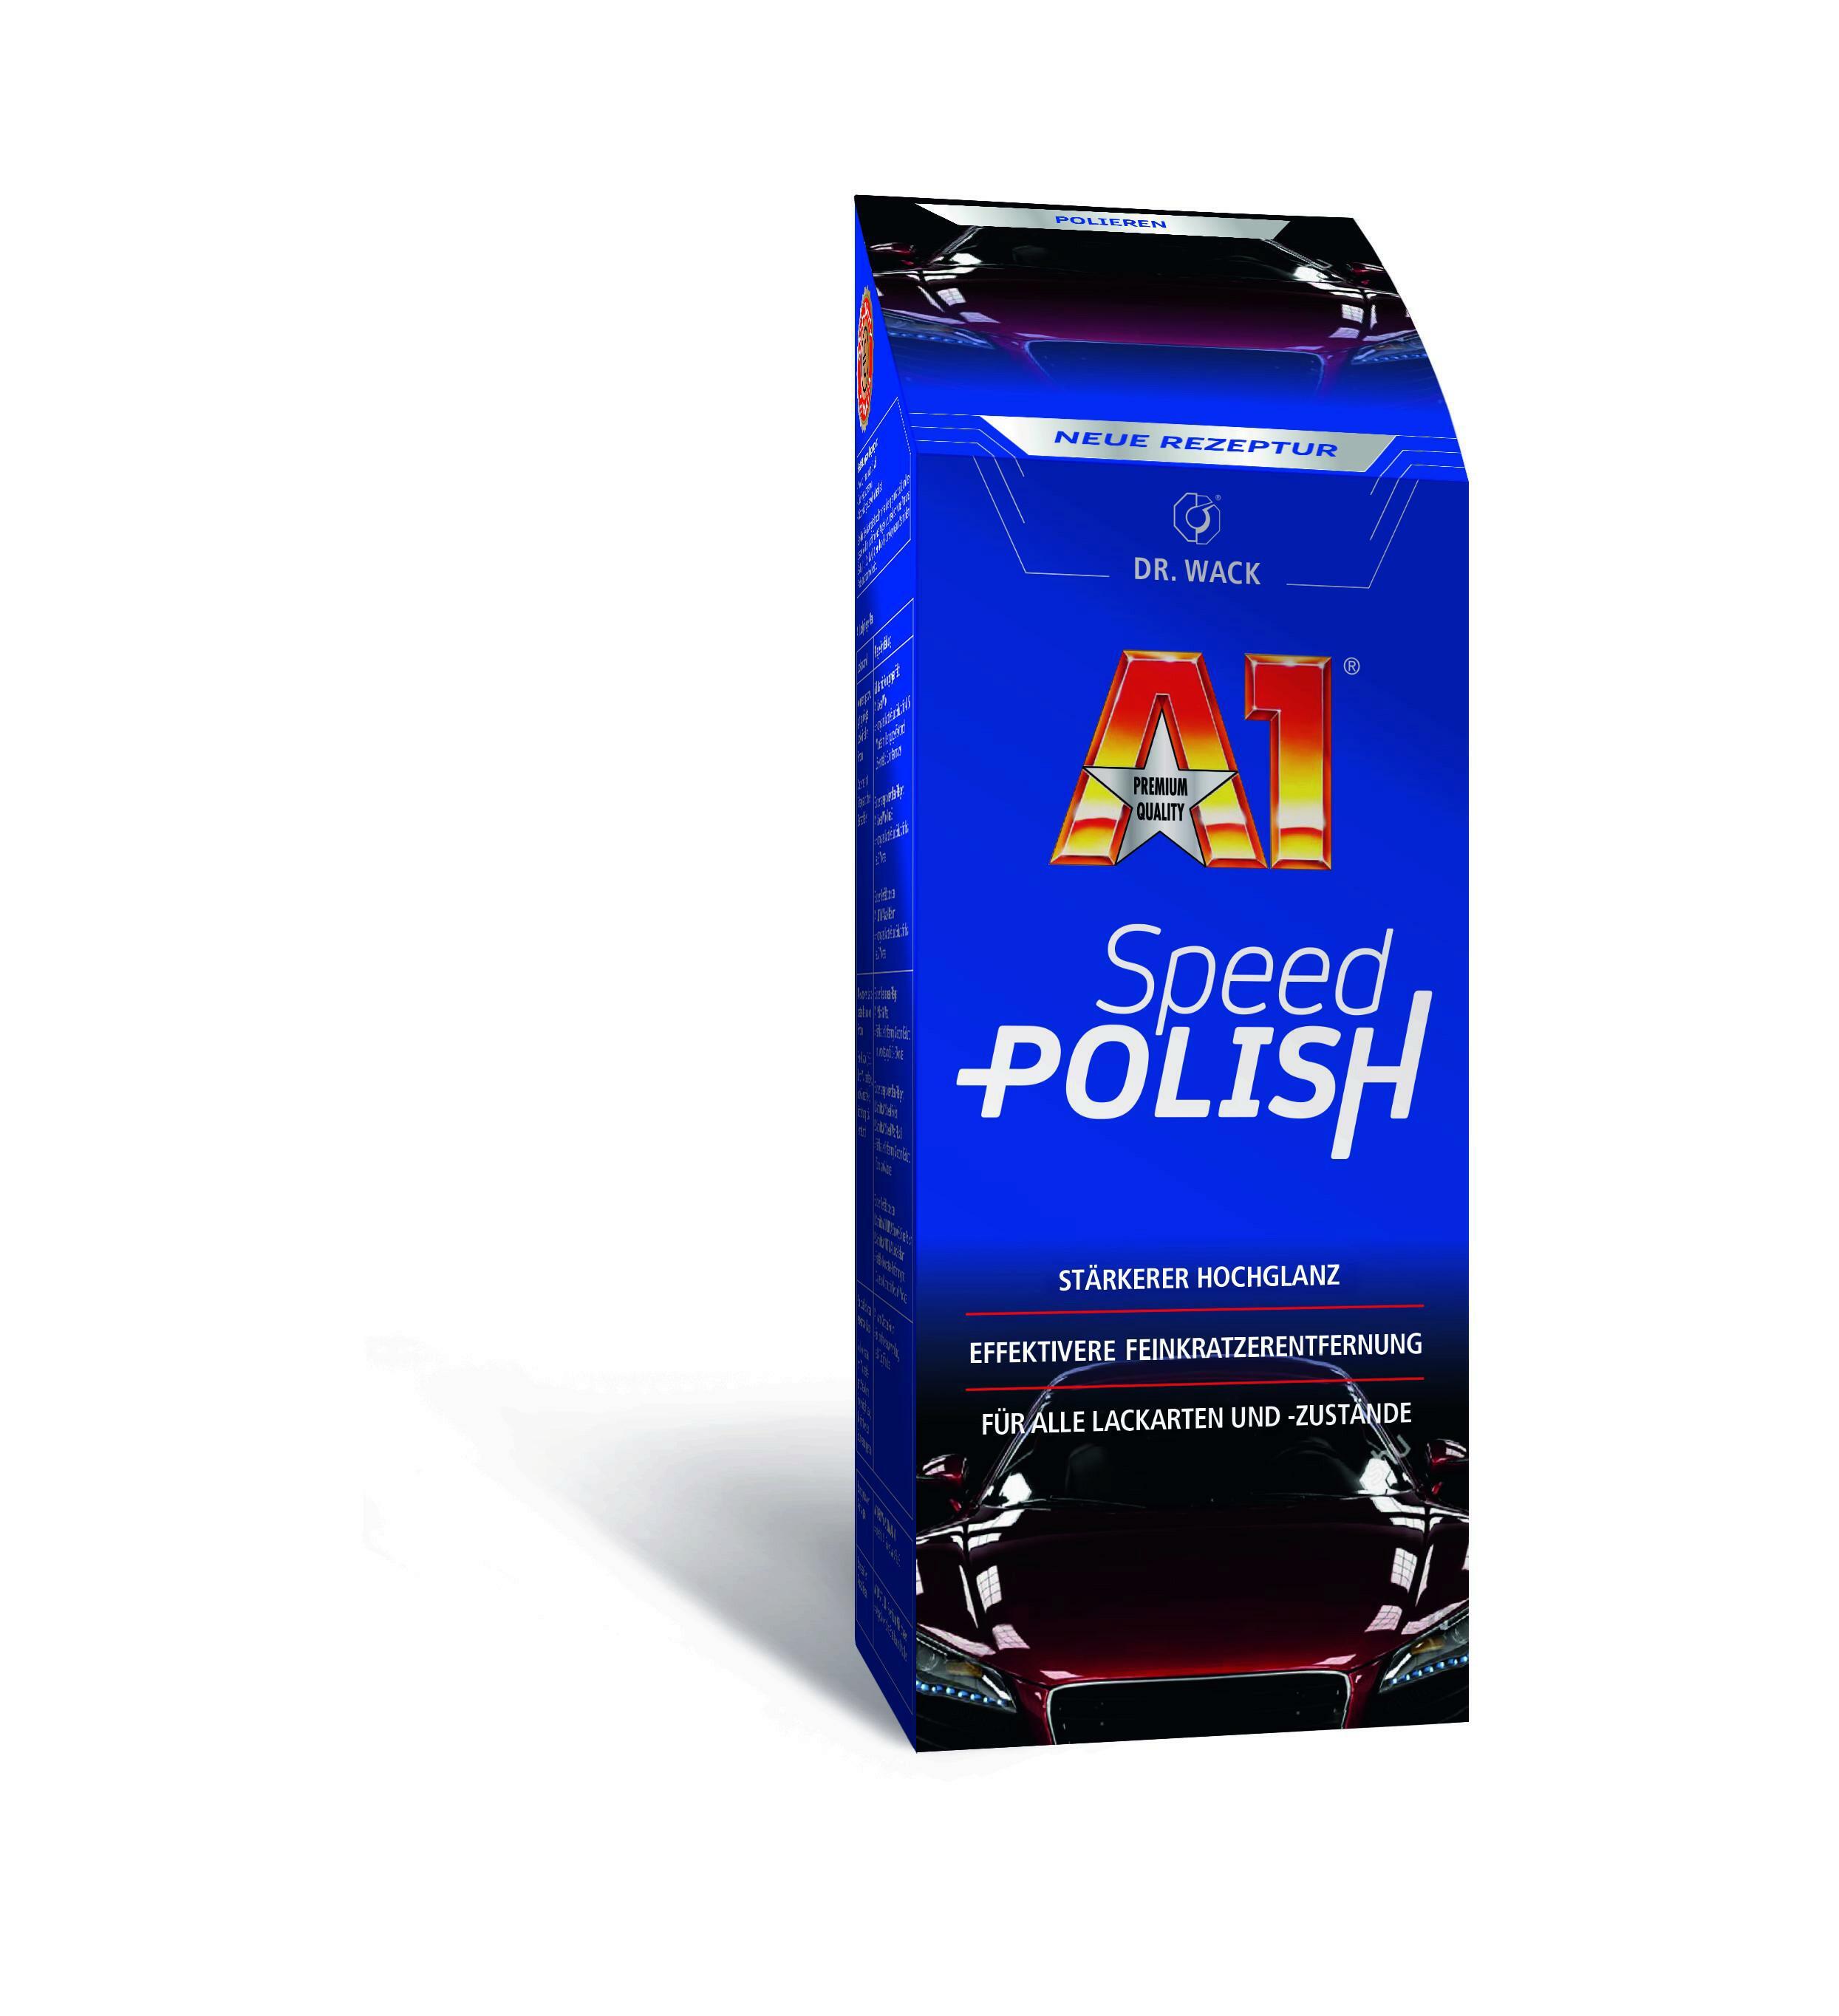 DR.Wack A1 Speed Polish Politur Lack Pflege Lack Versiegeleung